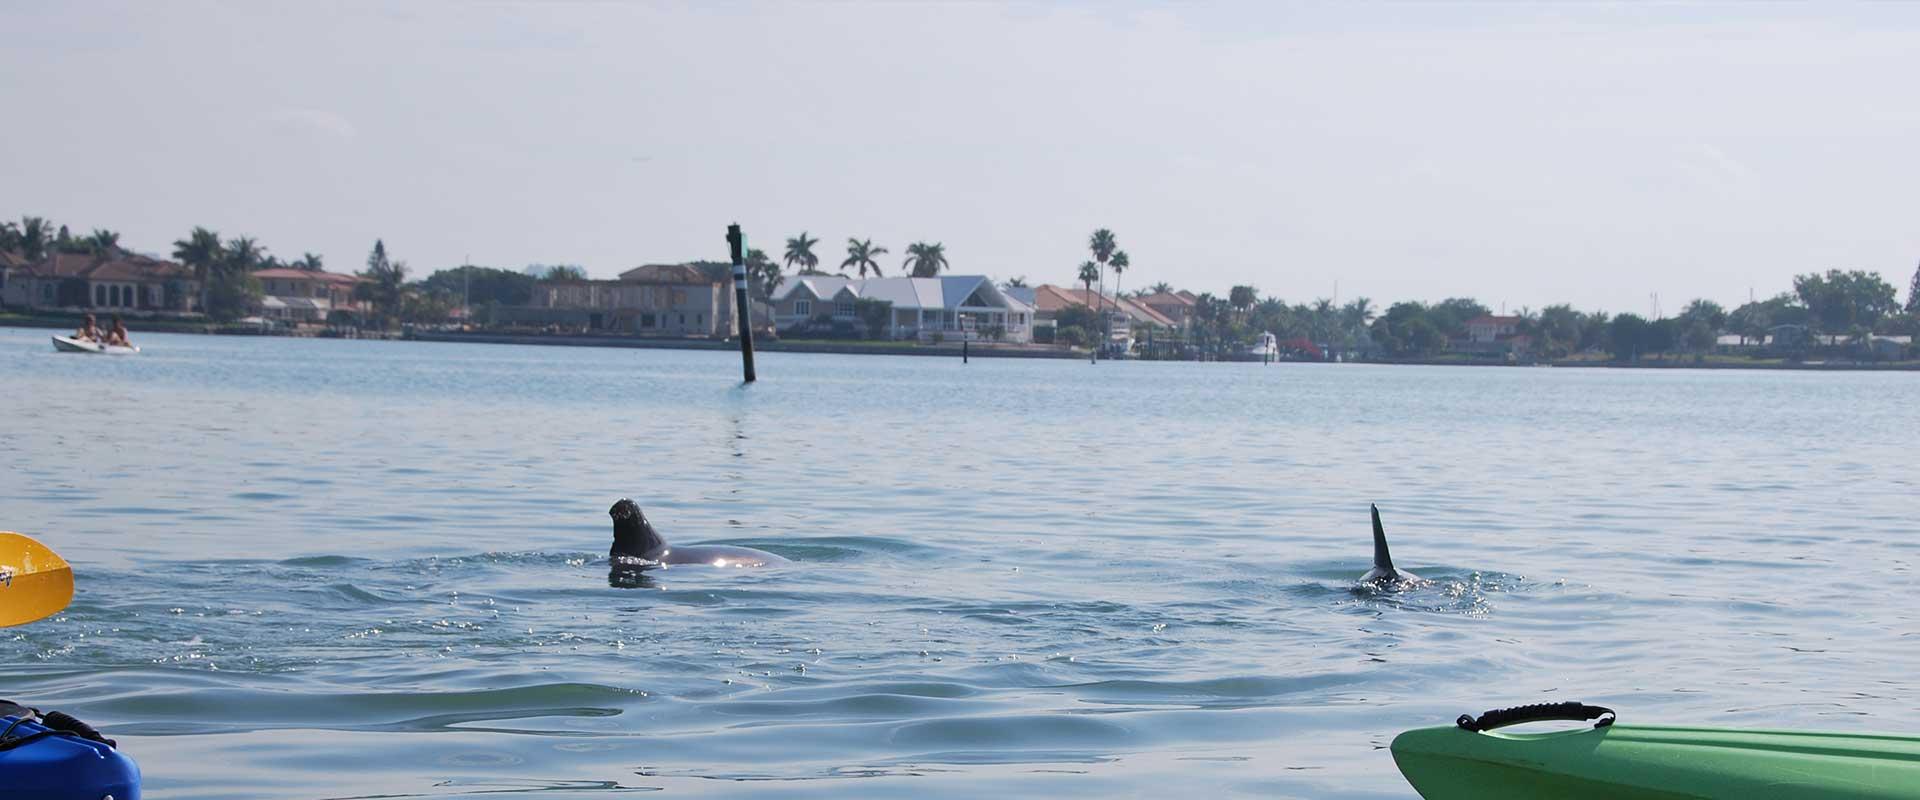 Everyone Should Go Kayaking